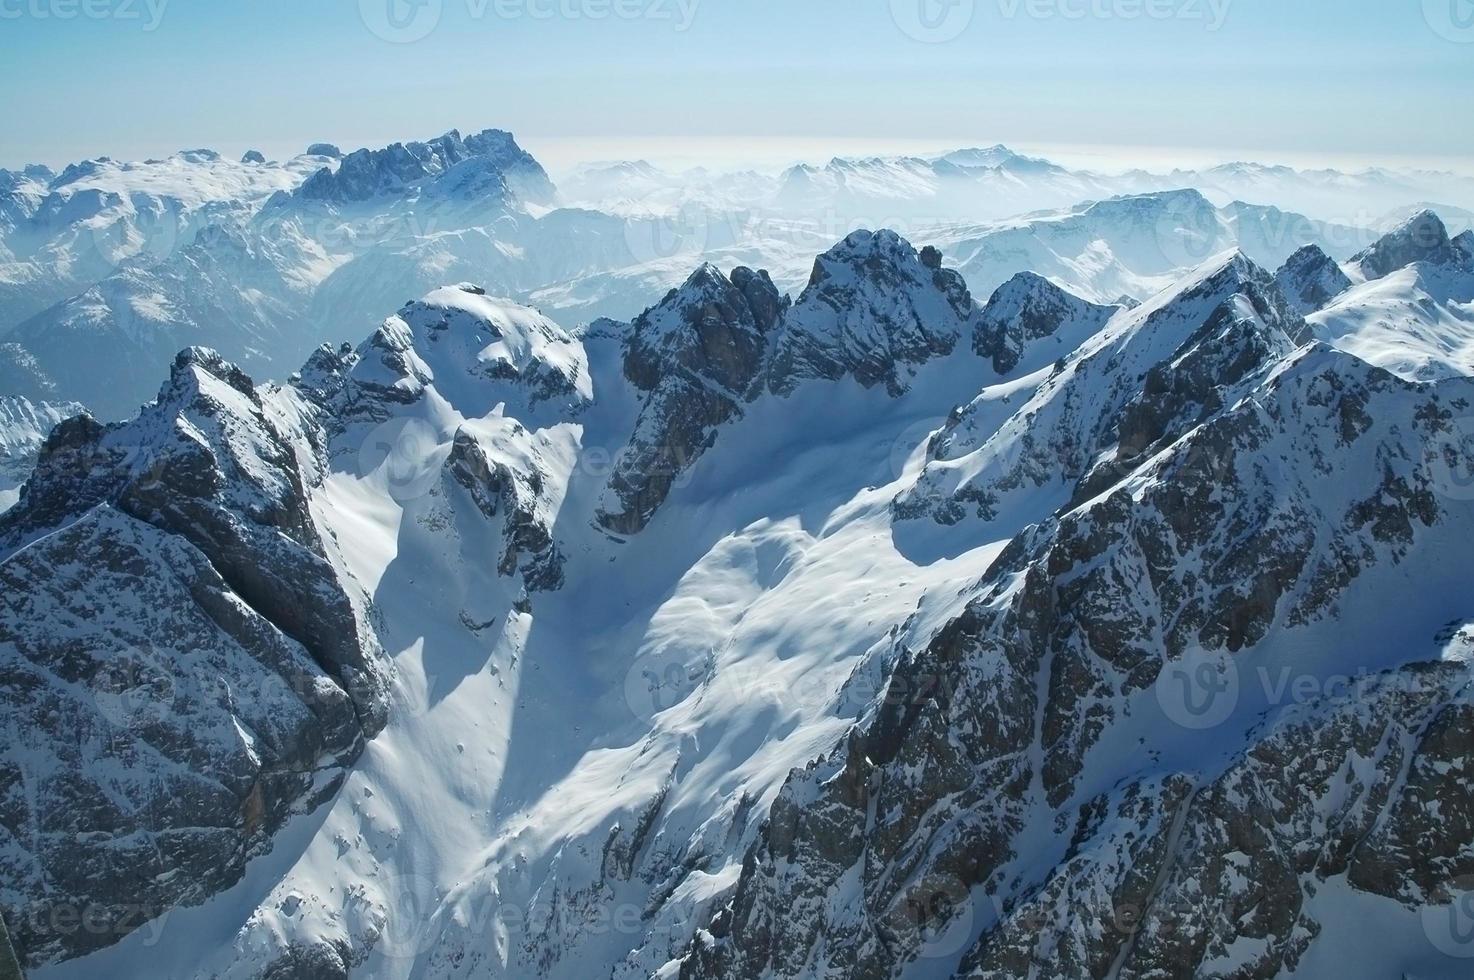 Dolomites mountains at winter, ski resort in Italy photo